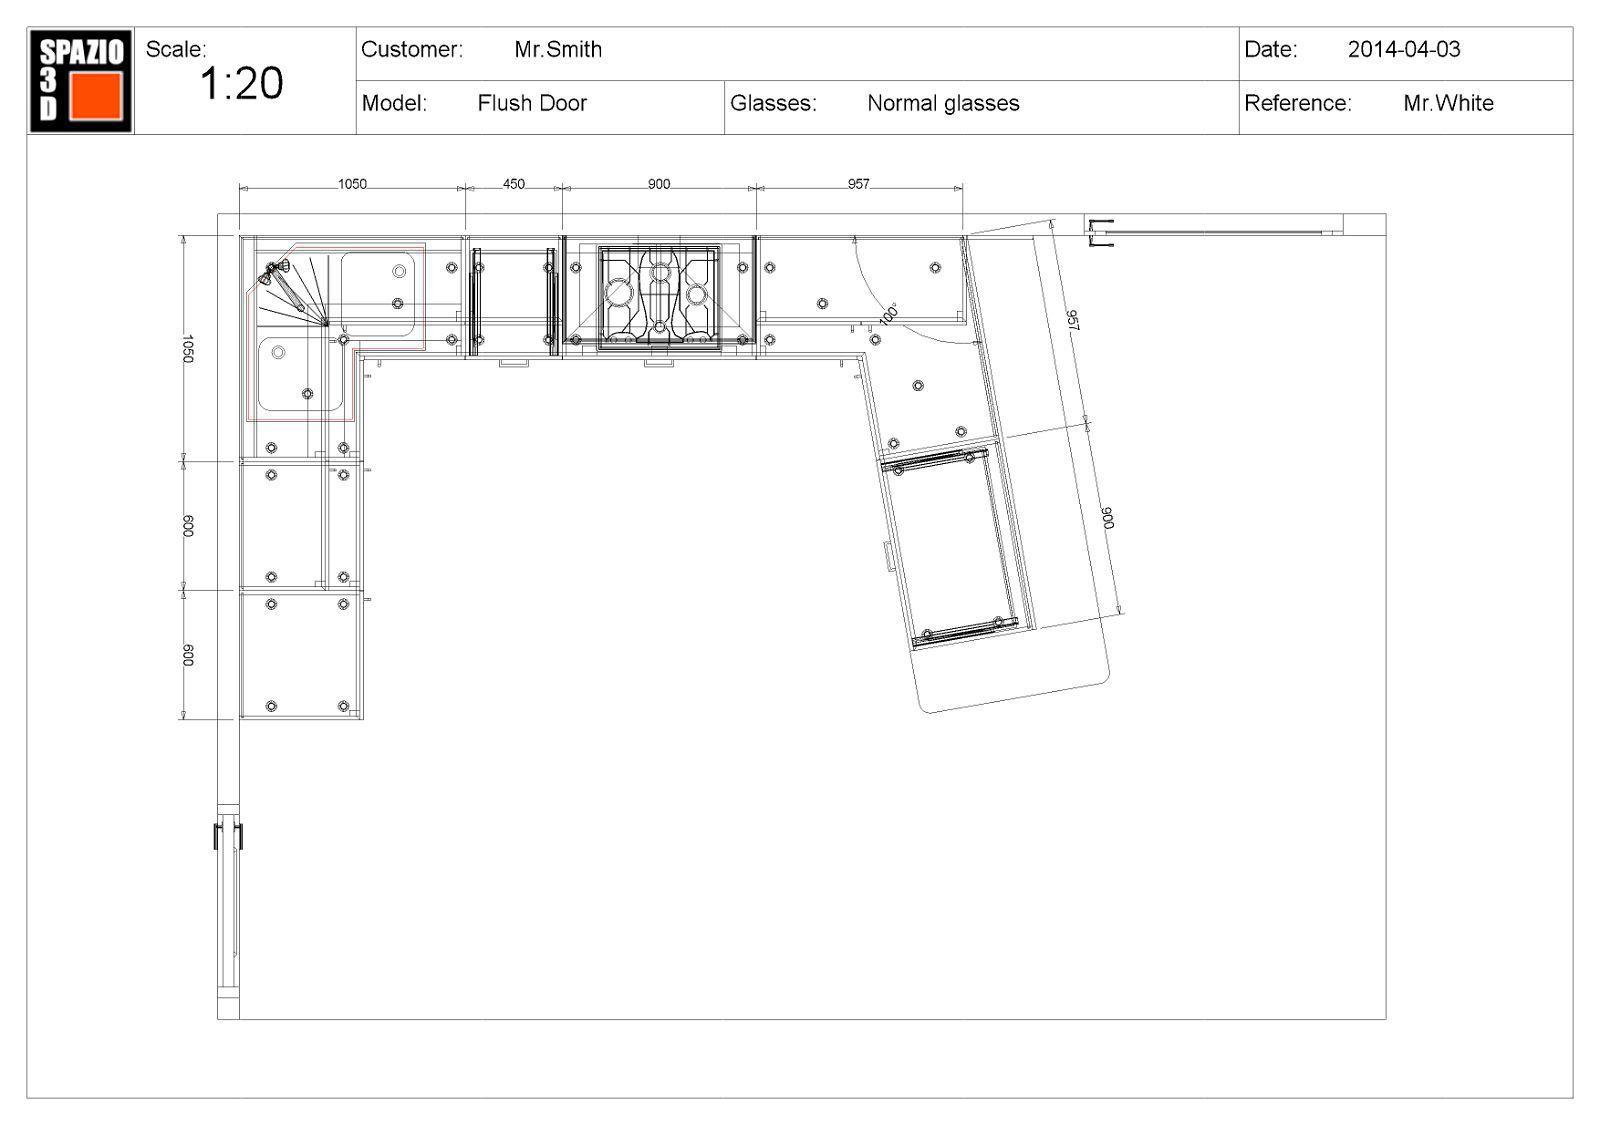 Furniture design software   CAD   for concrete structures   SPAZIO3D  TECHNICAL. Furniture design software   CAD   for concrete structures